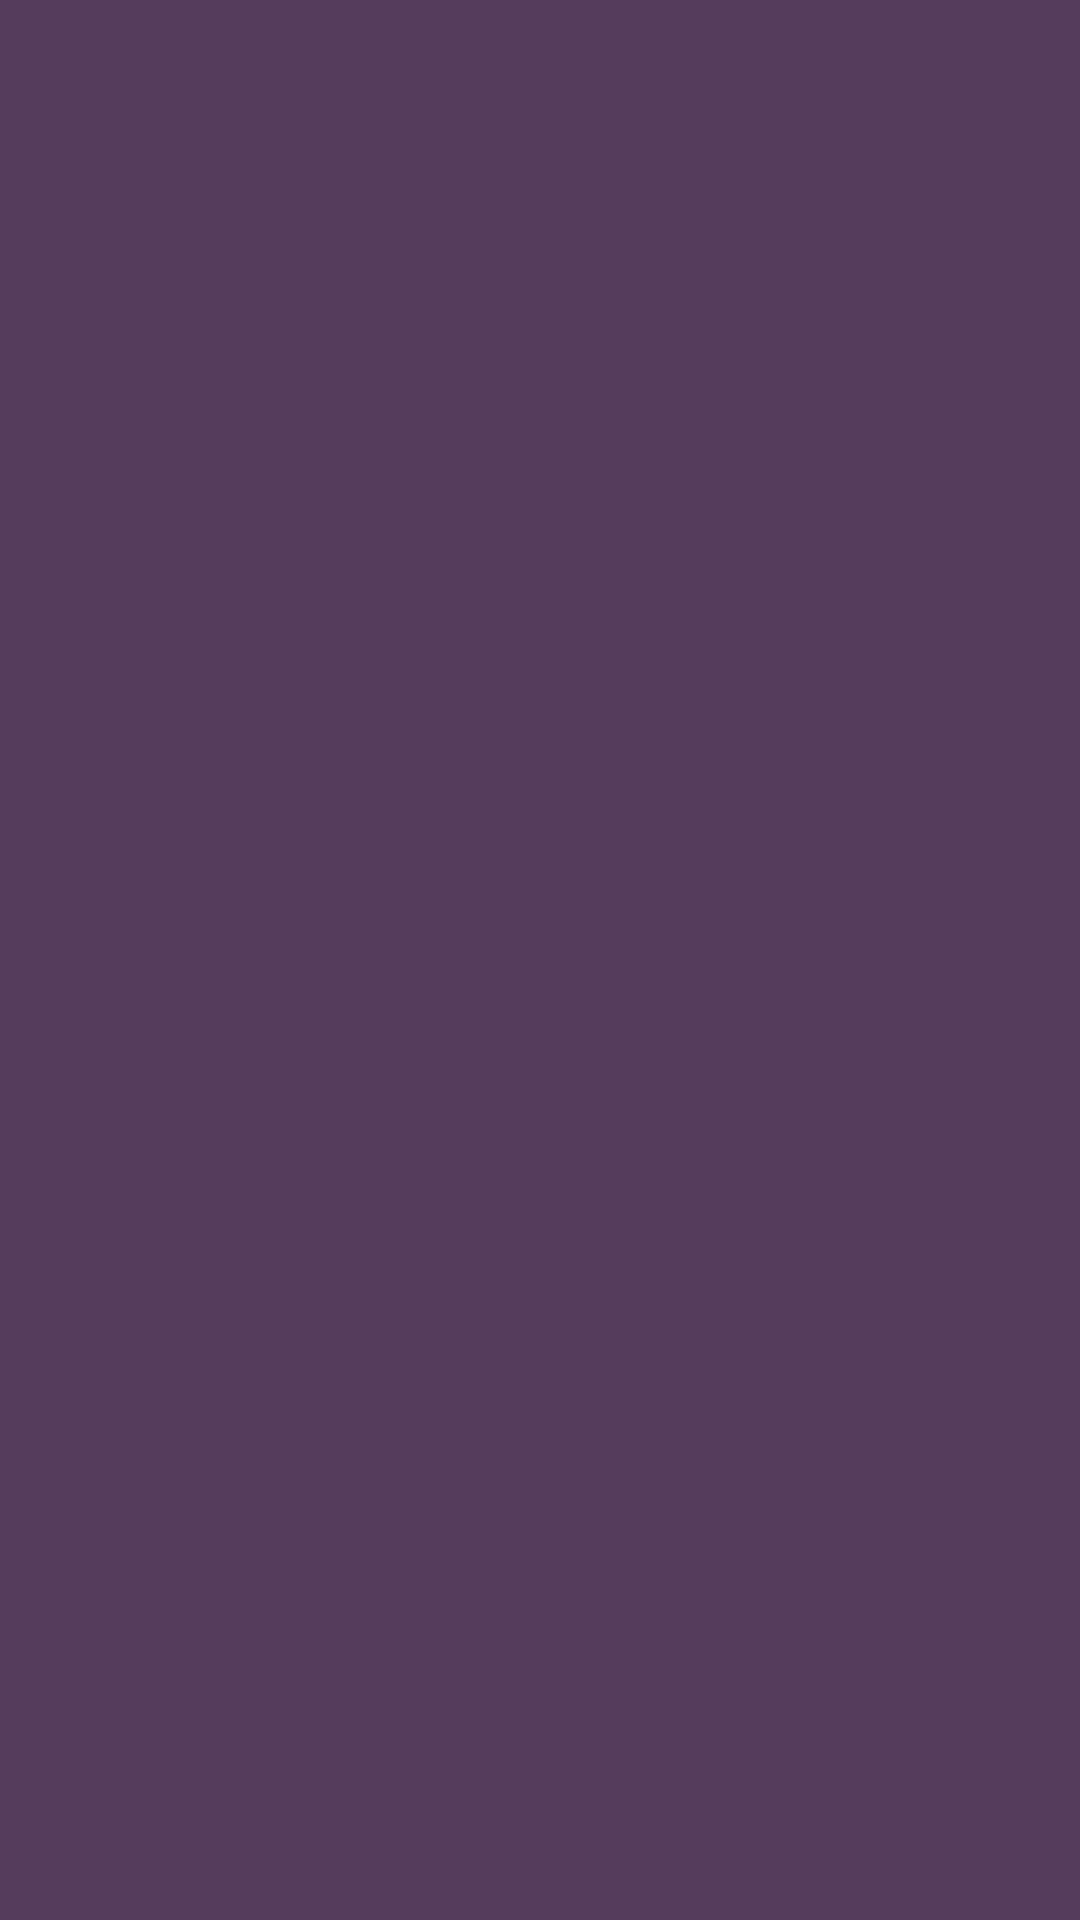 1080x1920 English Violet Solid Color Background